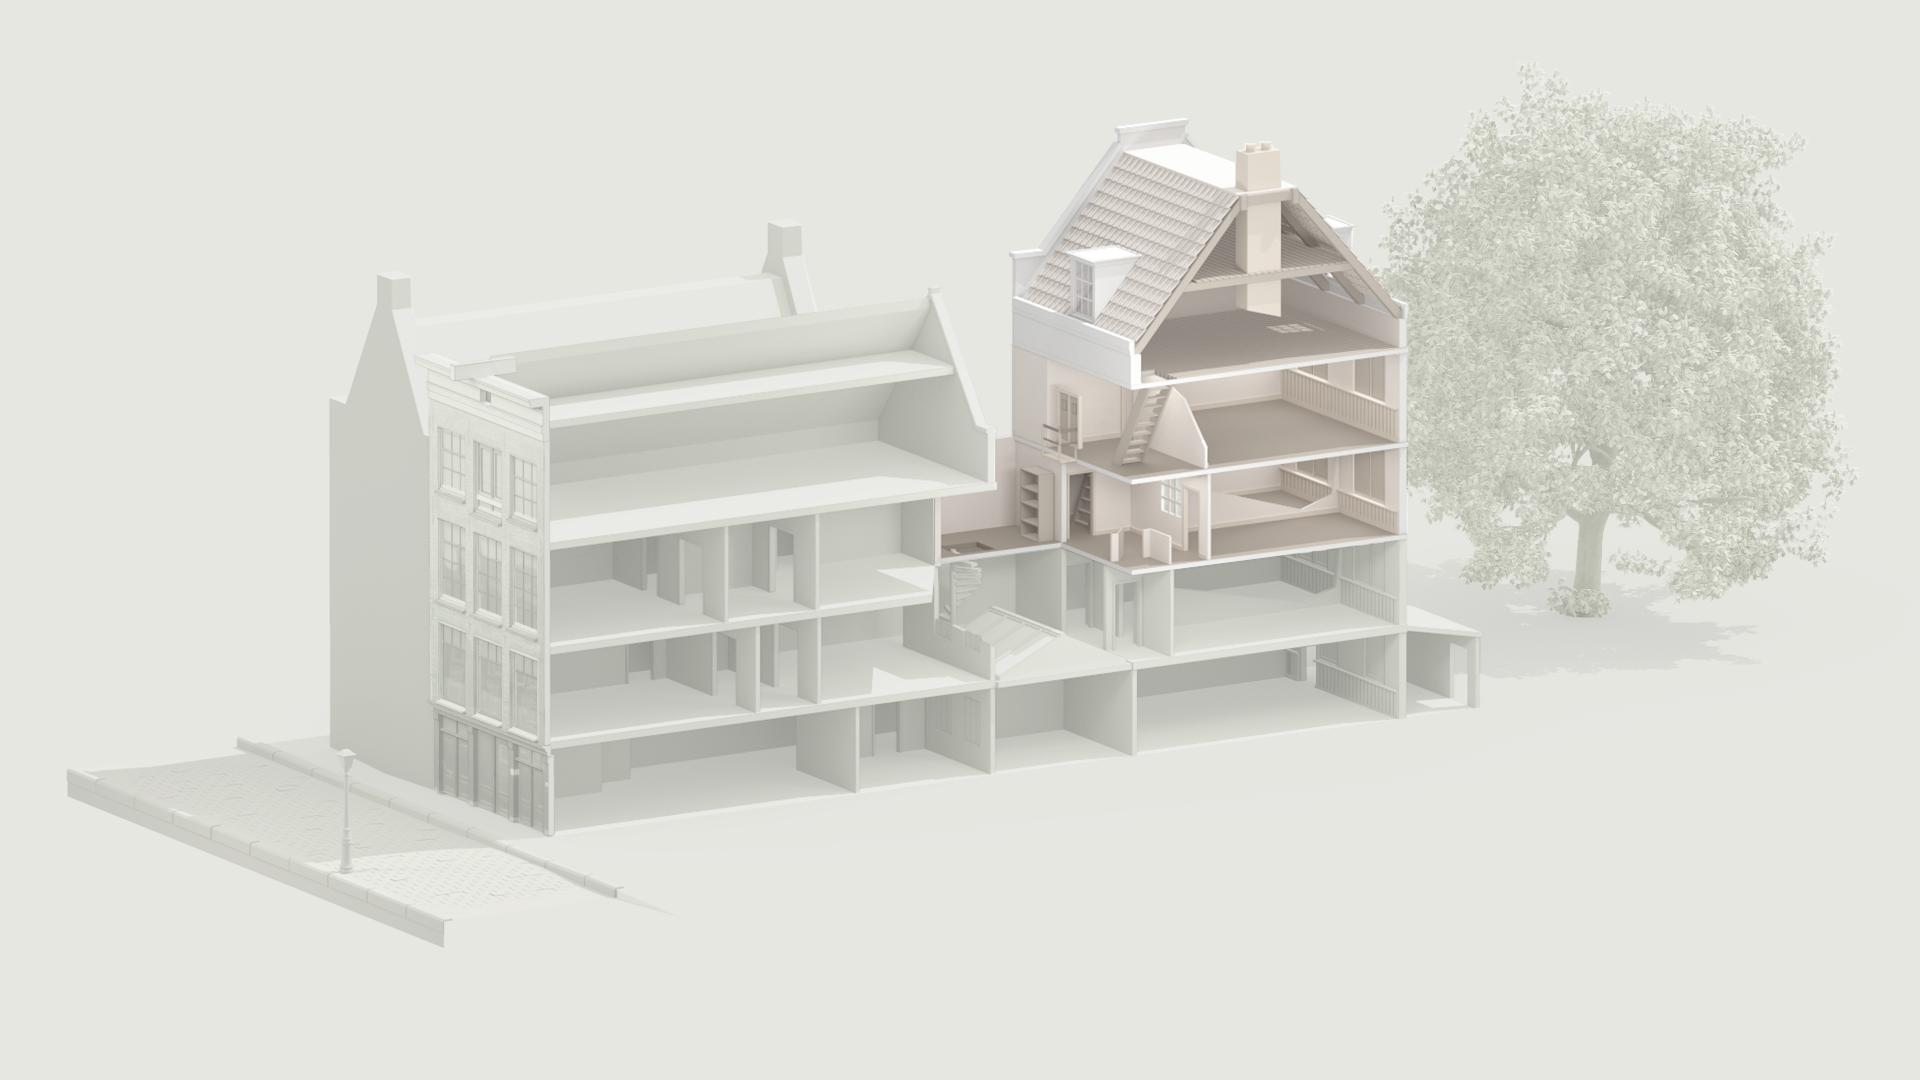 The Secret Annex Anne Frank House